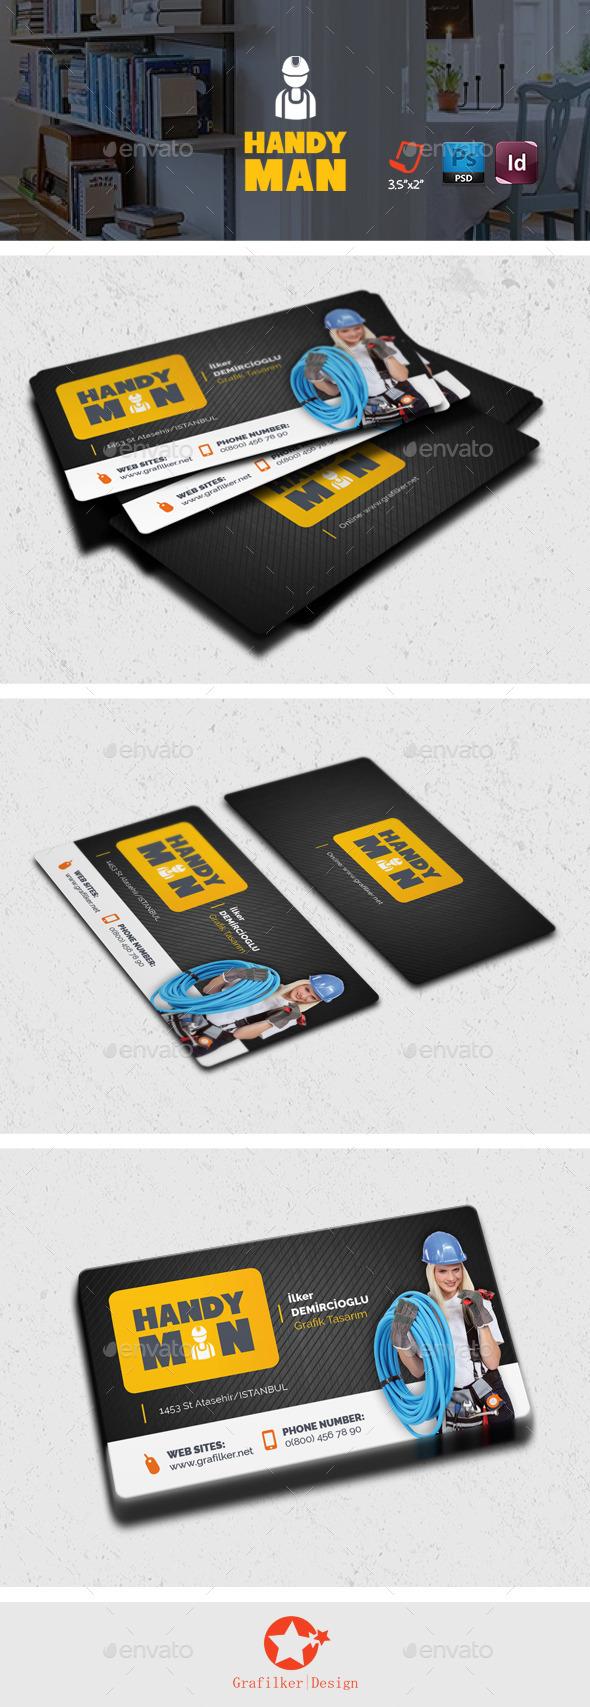 Handyman Business Card Templates